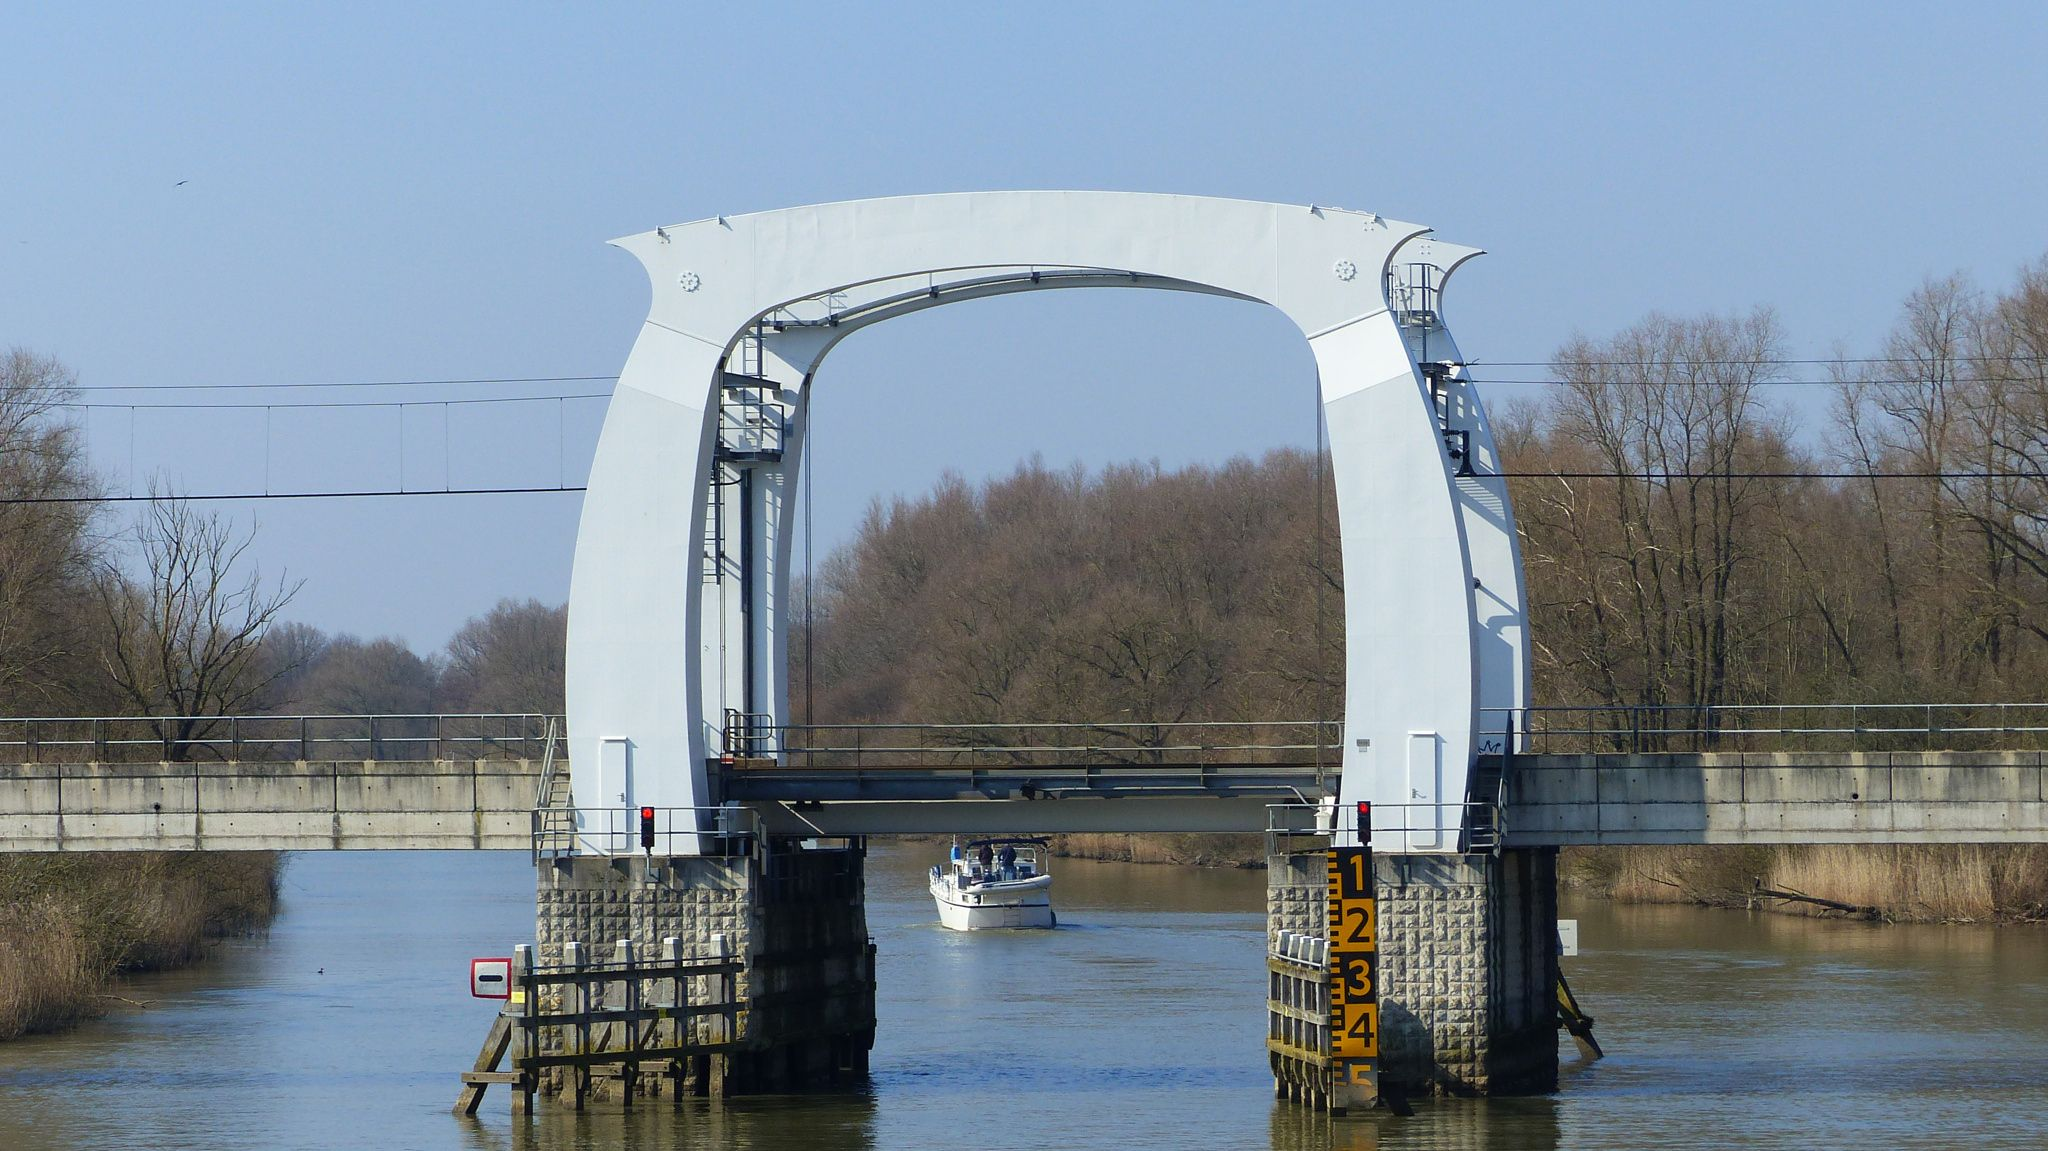 Bridge - A railway bridge across the river Wantij